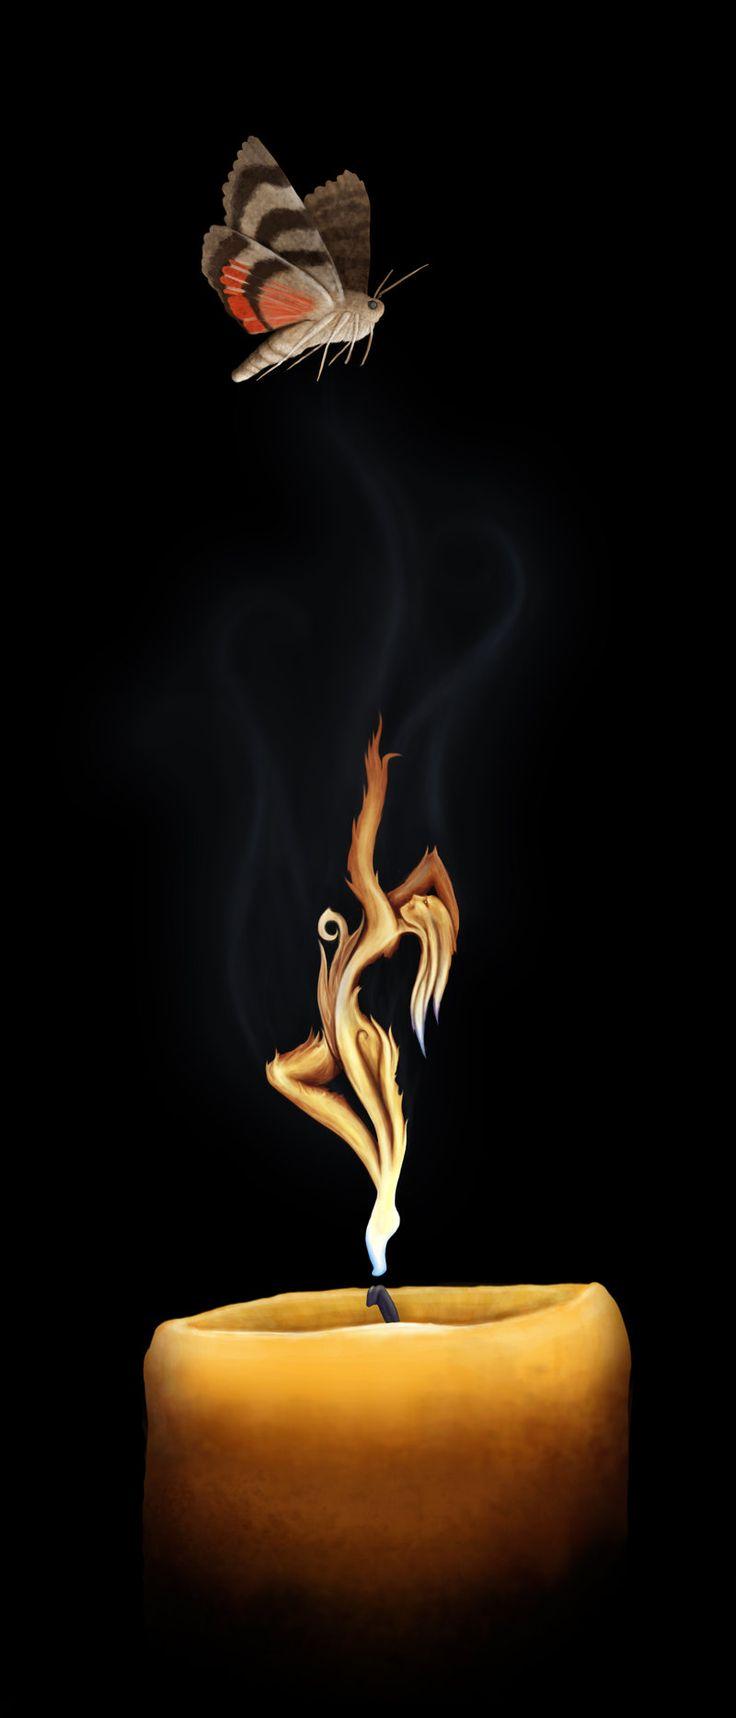 Flaming art tattoo for geek tattoo lovers this kind of batman - Moth_to_a_flame Moth Tattootattoo Inspirationbook